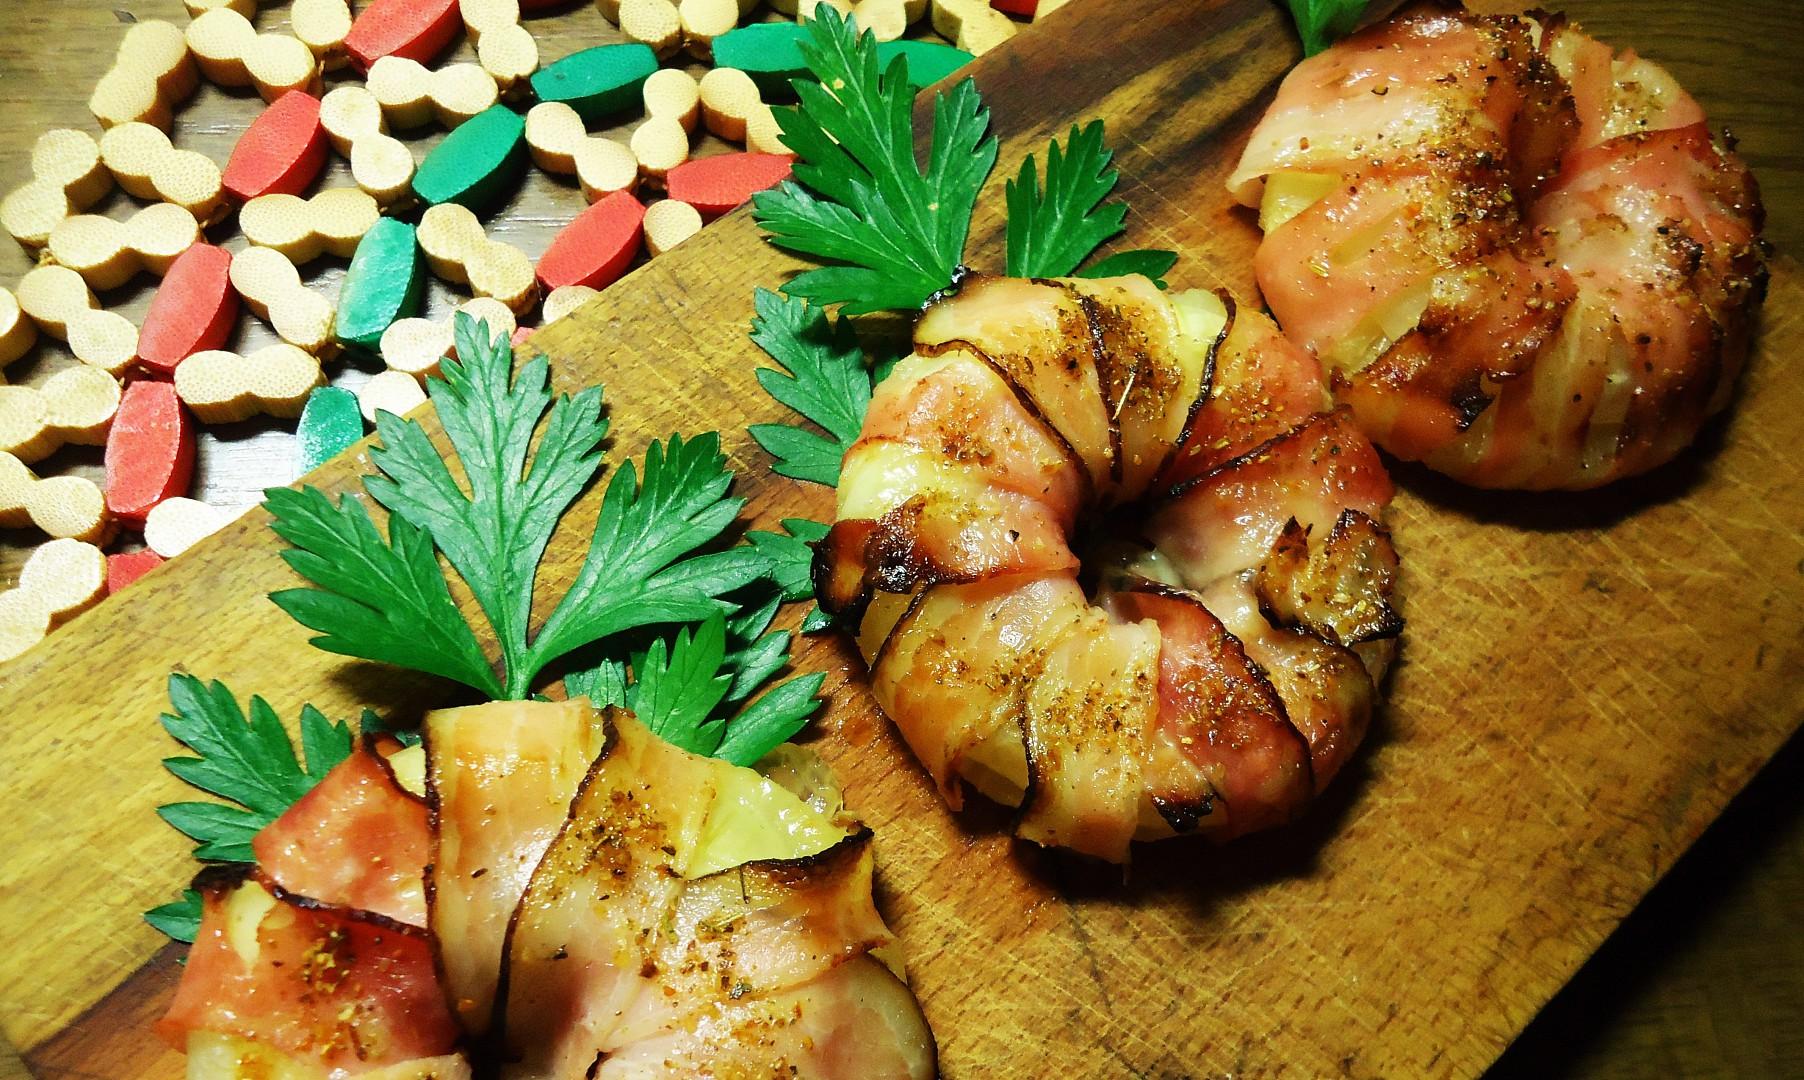 Slanino-ananasová grilovaná kolečka recept